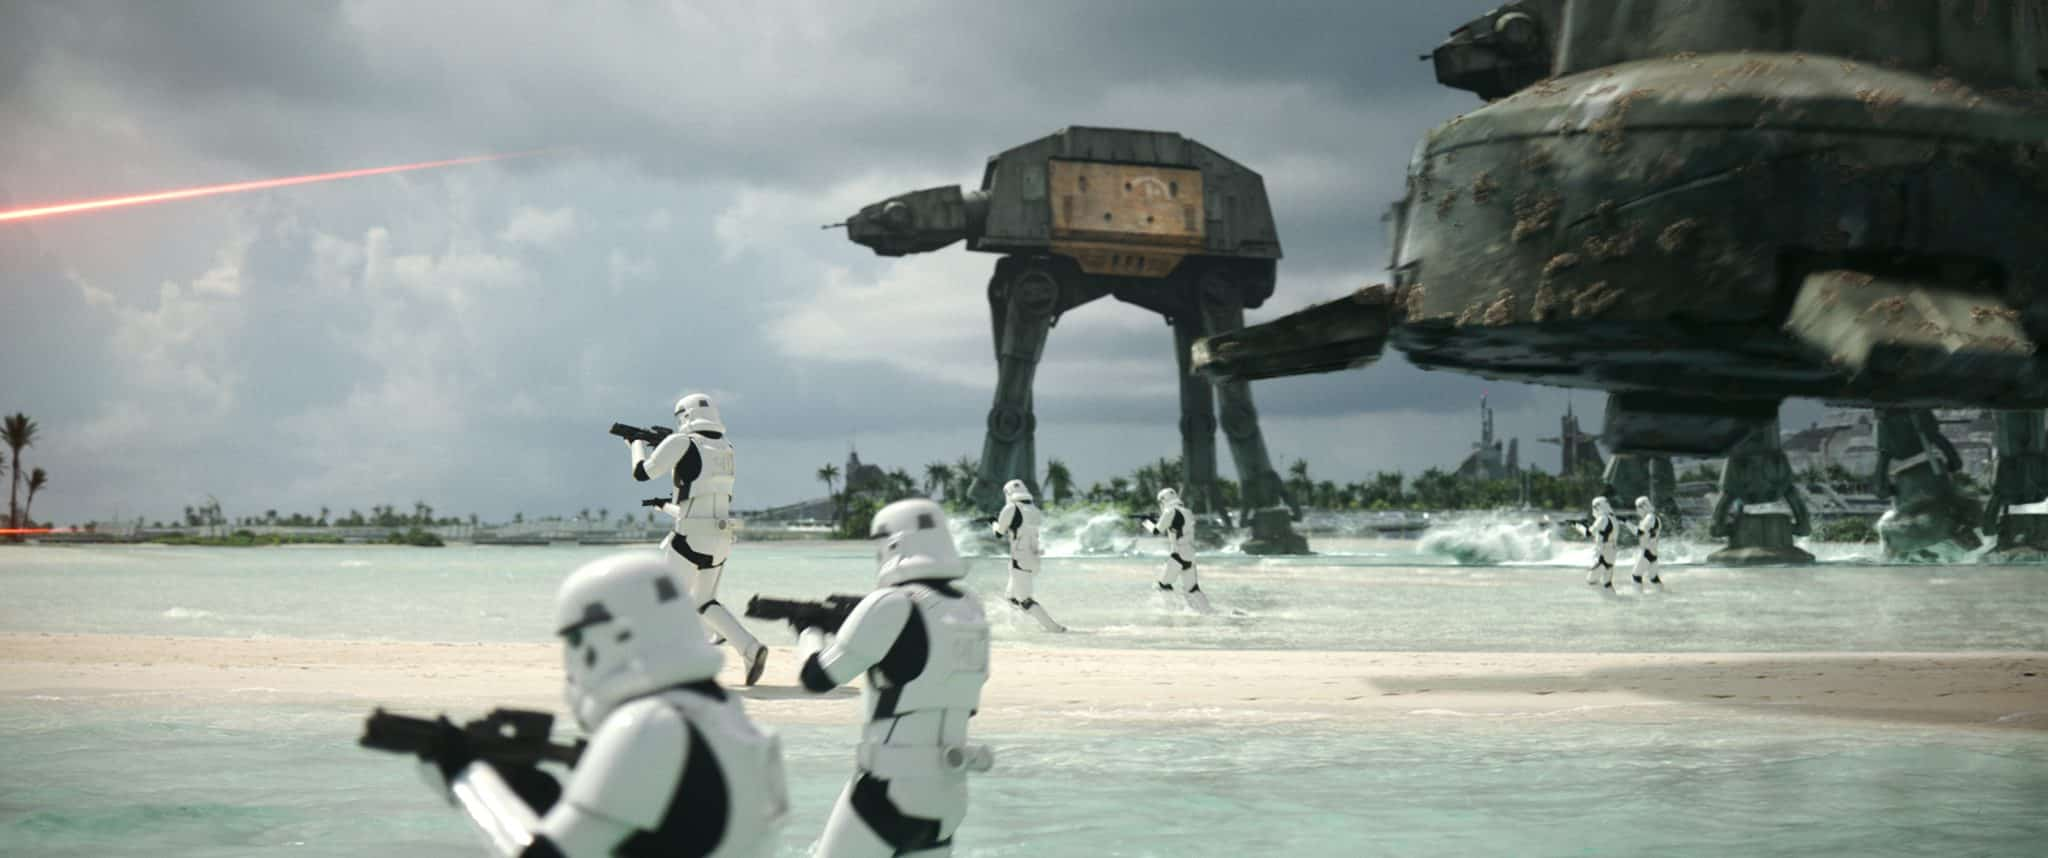 Rogue One: A Star Wars Story; Zdroj: collider.com